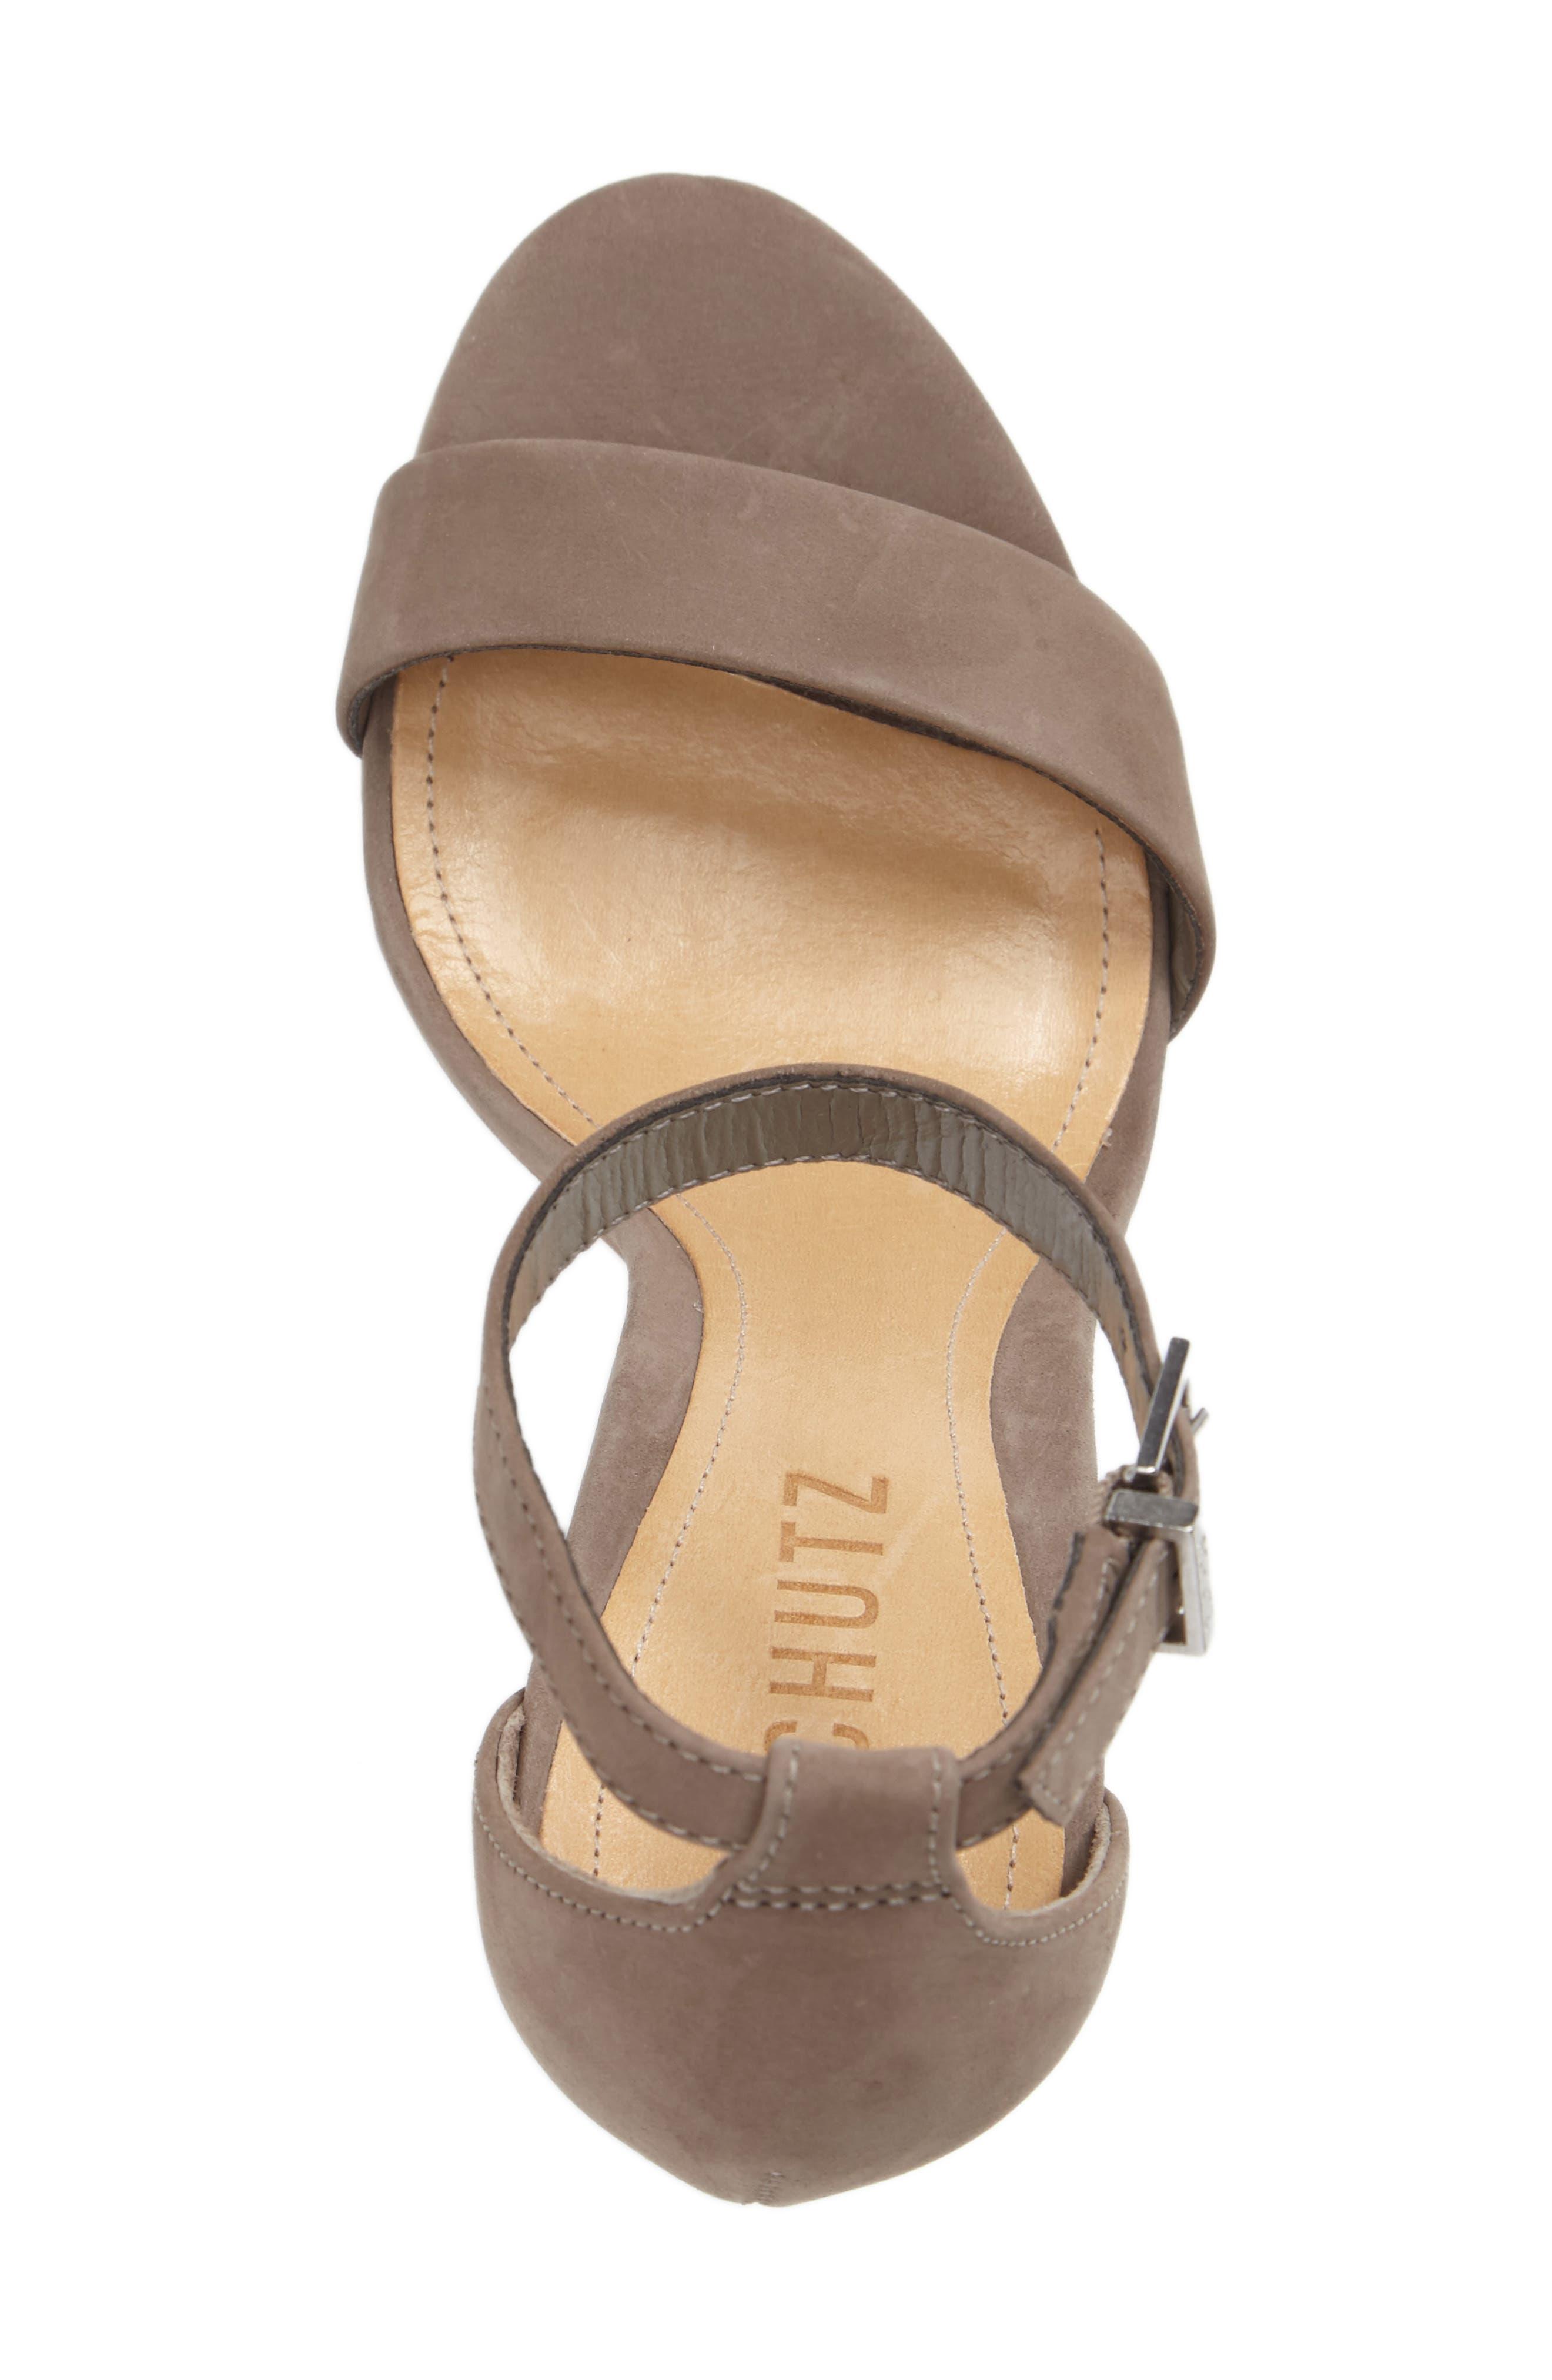 Enida Sandal,                             Alternate thumbnail 3, color,                             Mouse Nubuck Leather